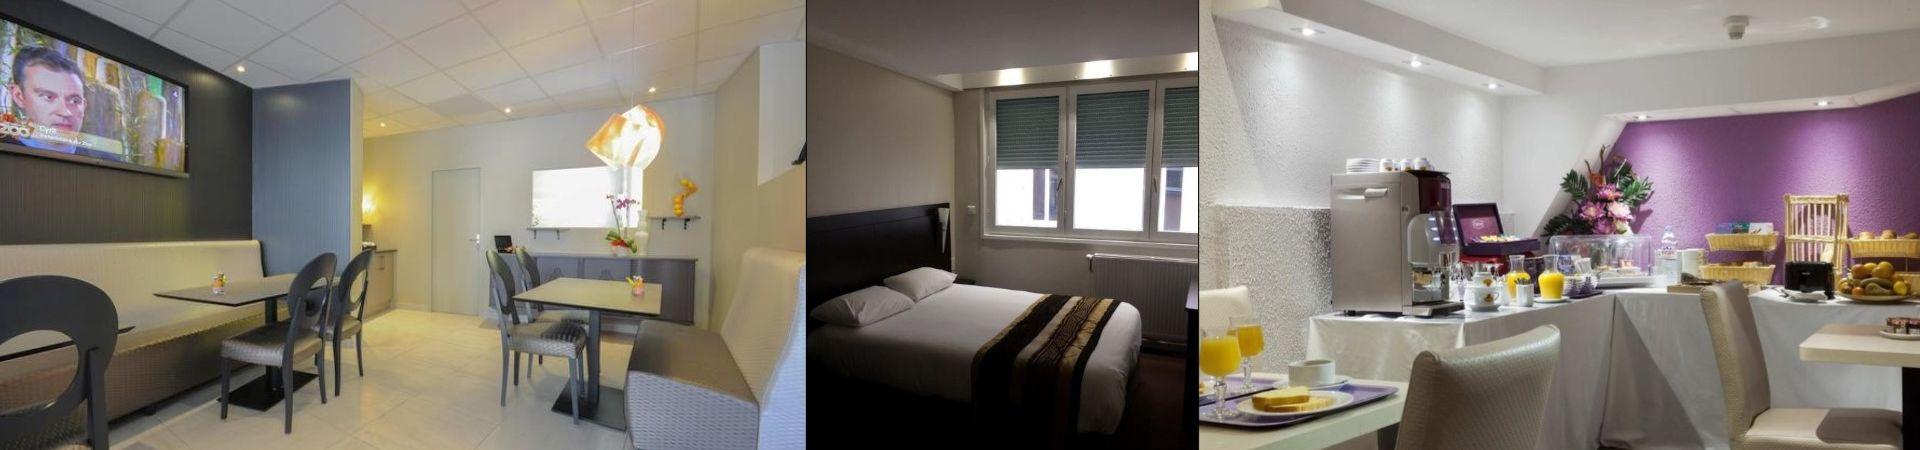 entreprise artisan renovation appartement maison isere 38. Black Bedroom Furniture Sets. Home Design Ideas